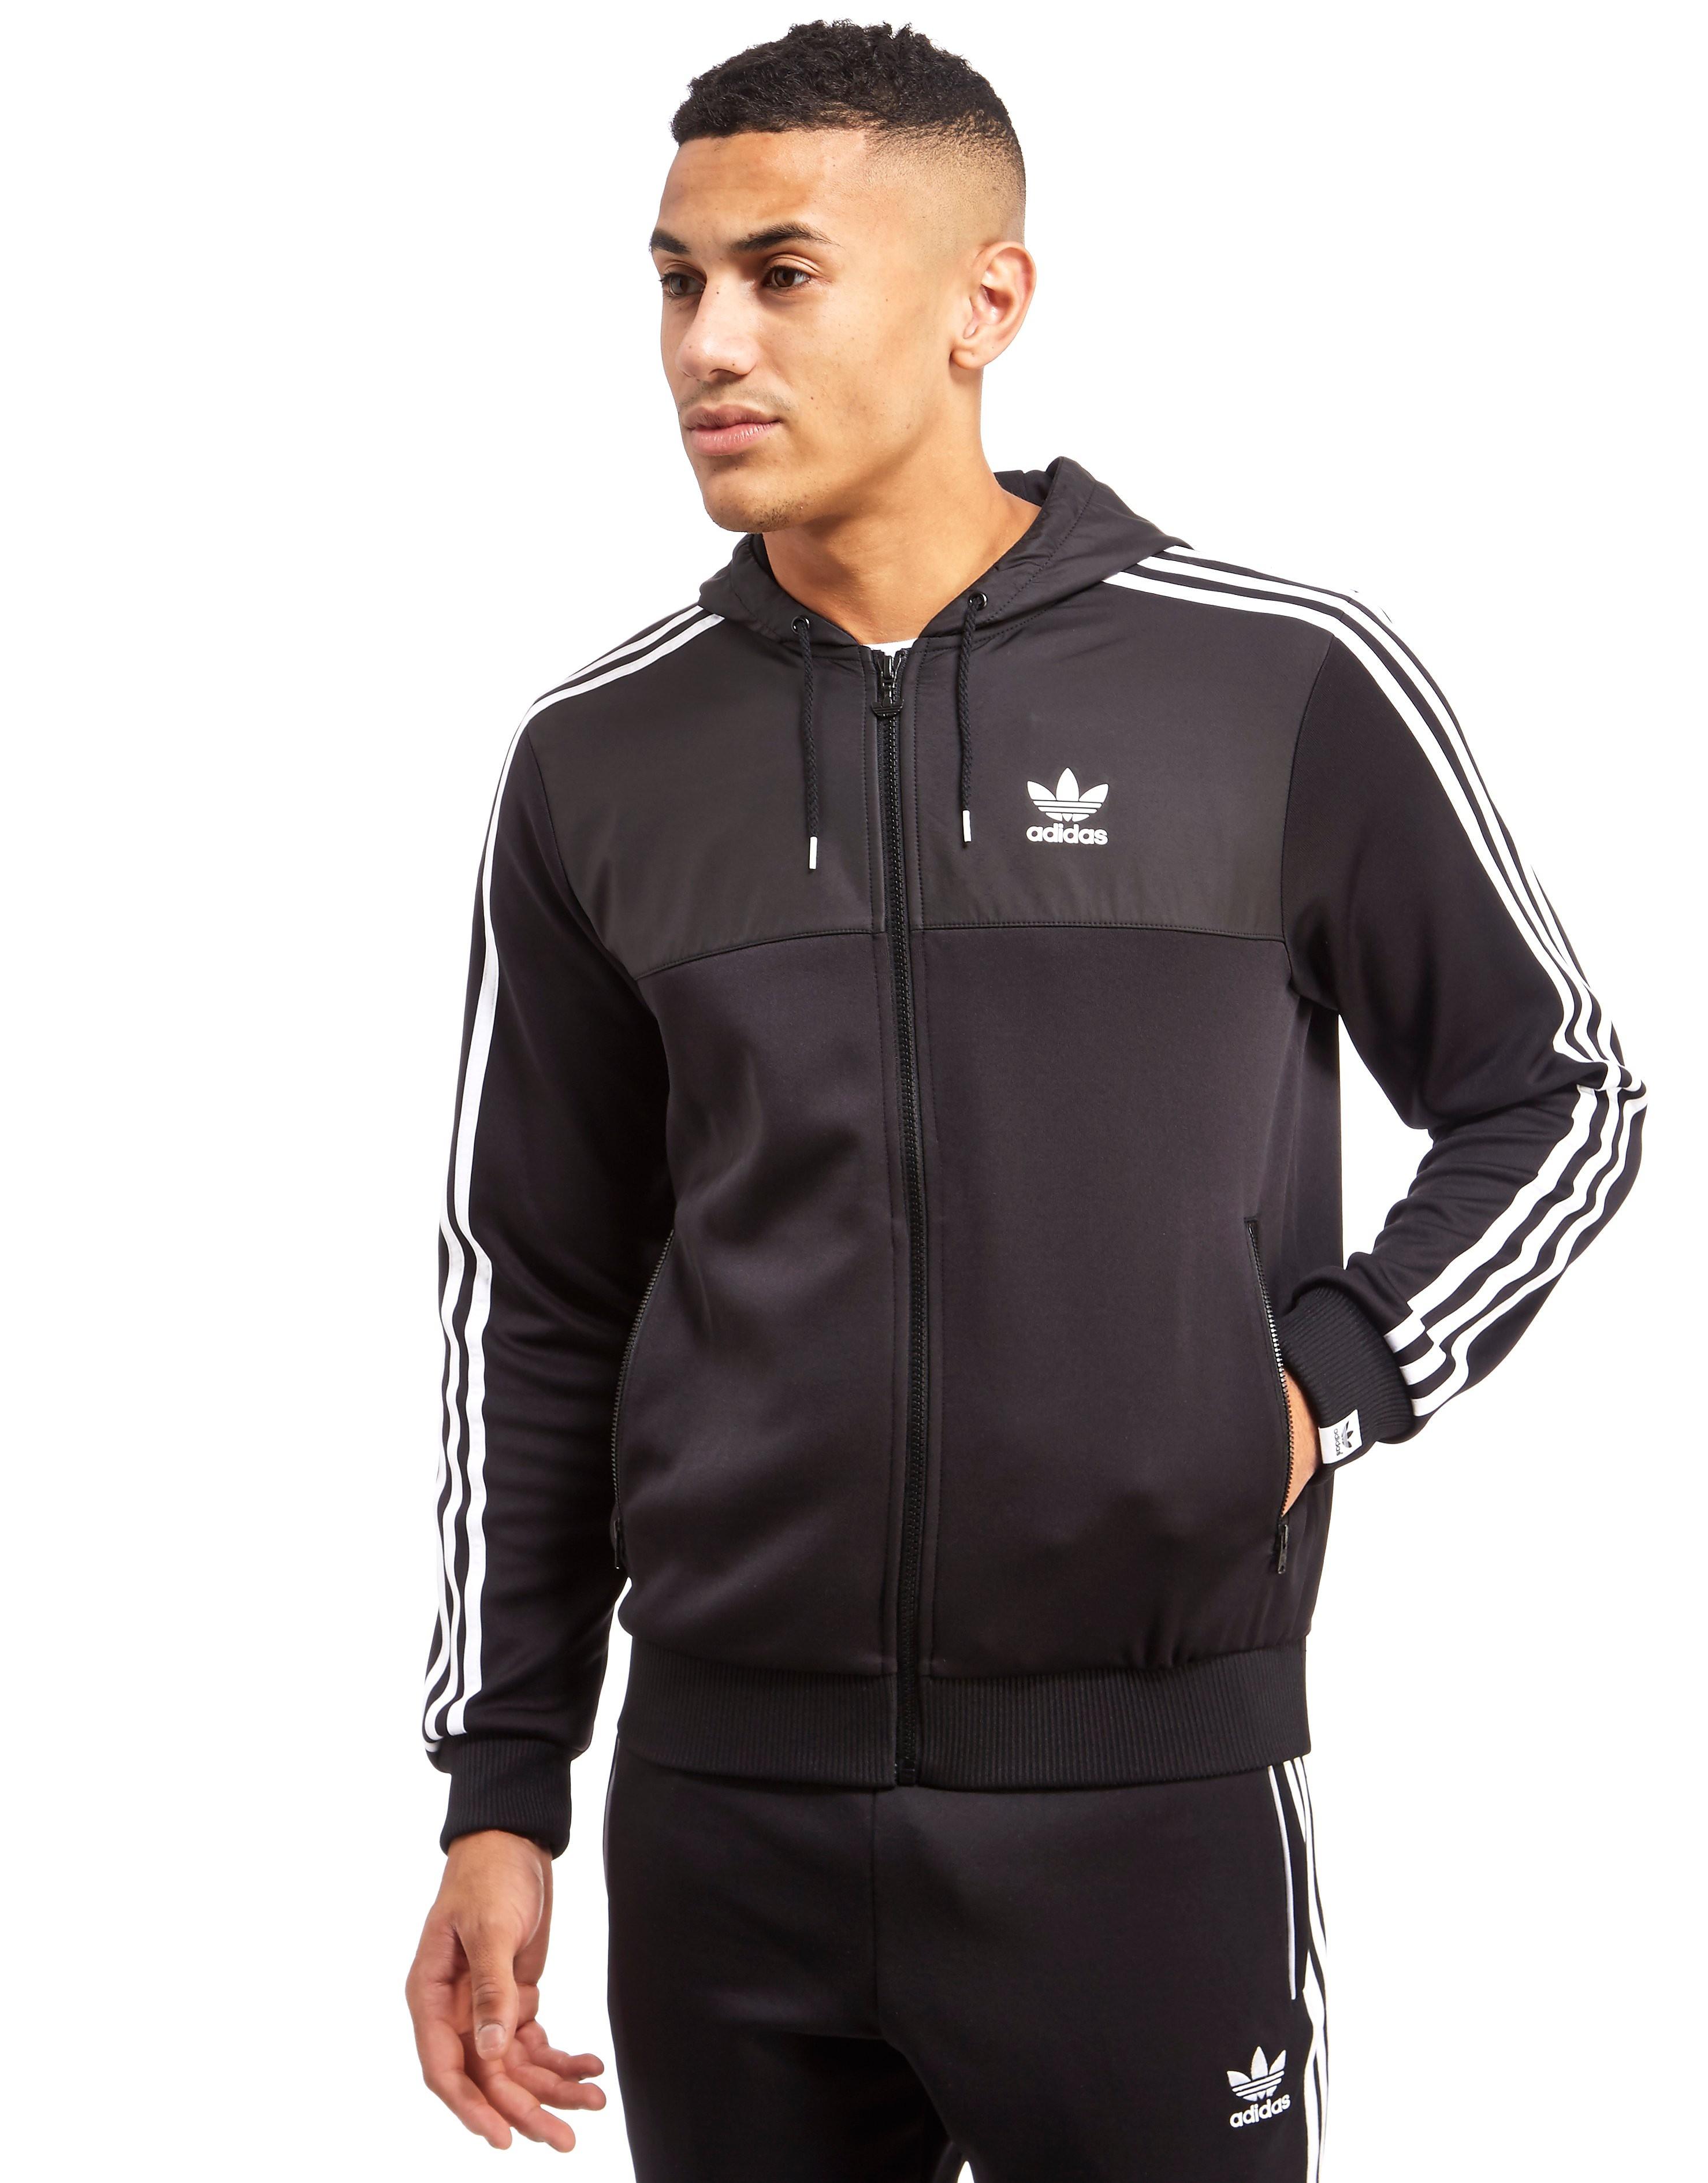 adidas Originals Newark Full Zip Hoody